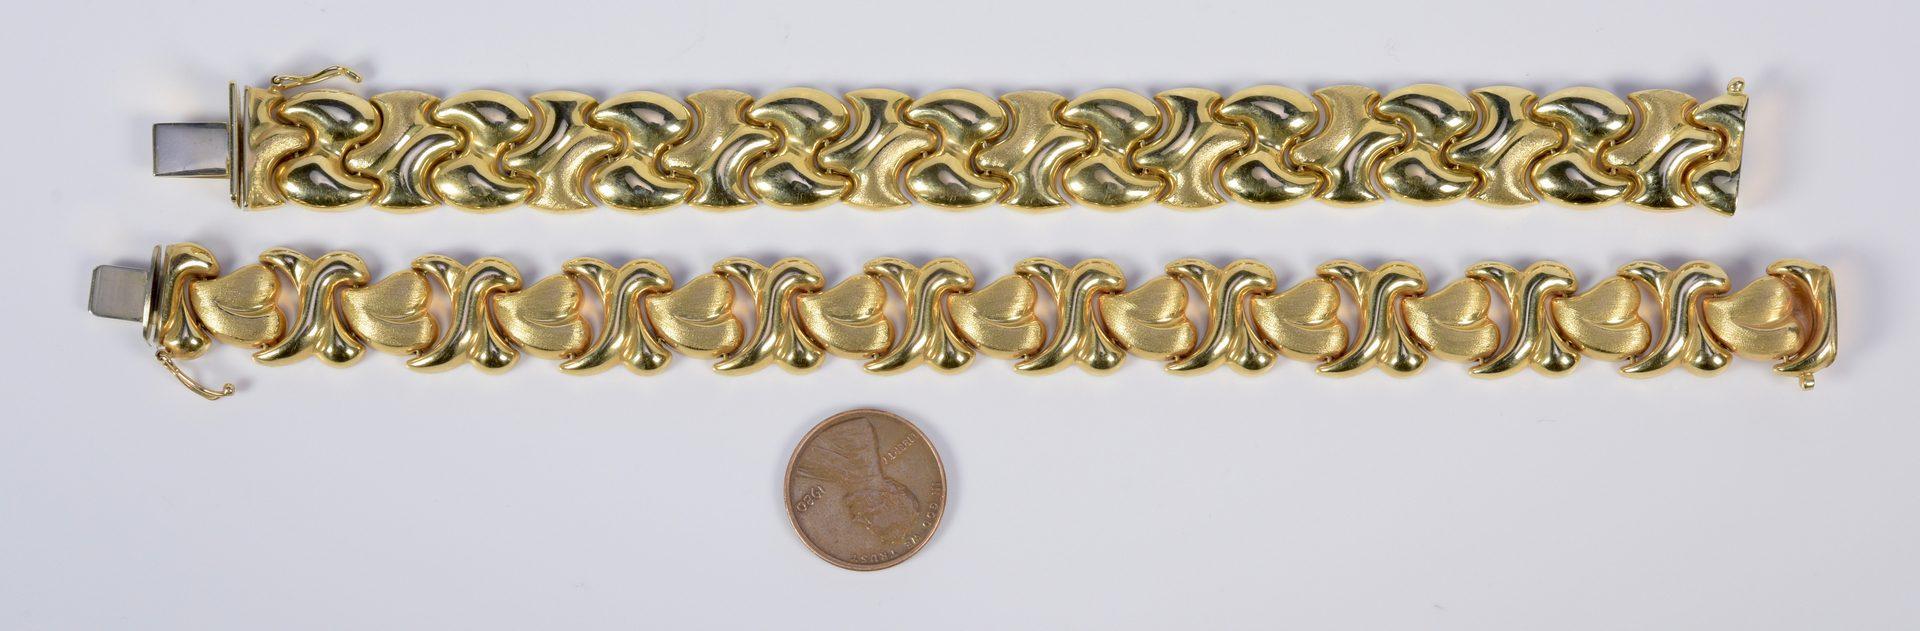 Lot 797: Two 14K Link Bracelets, 37.9 grams